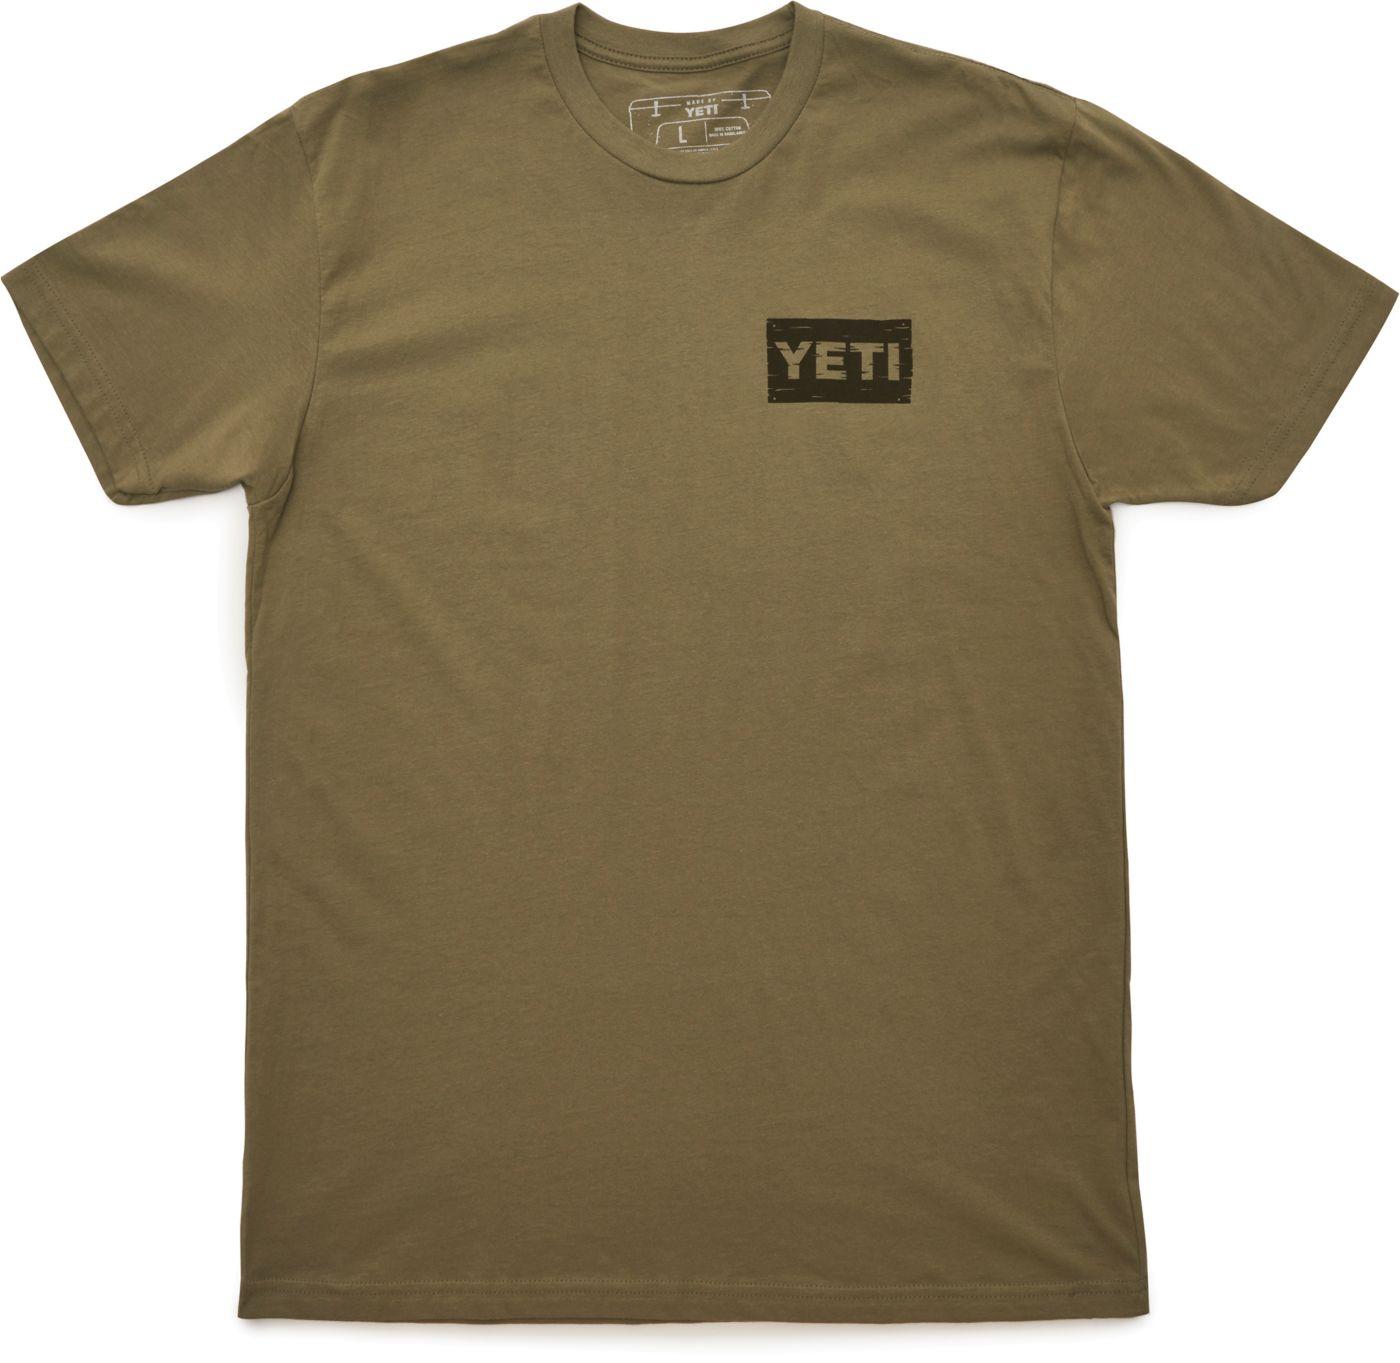 YETI Men's Bait Shop T-Shirt